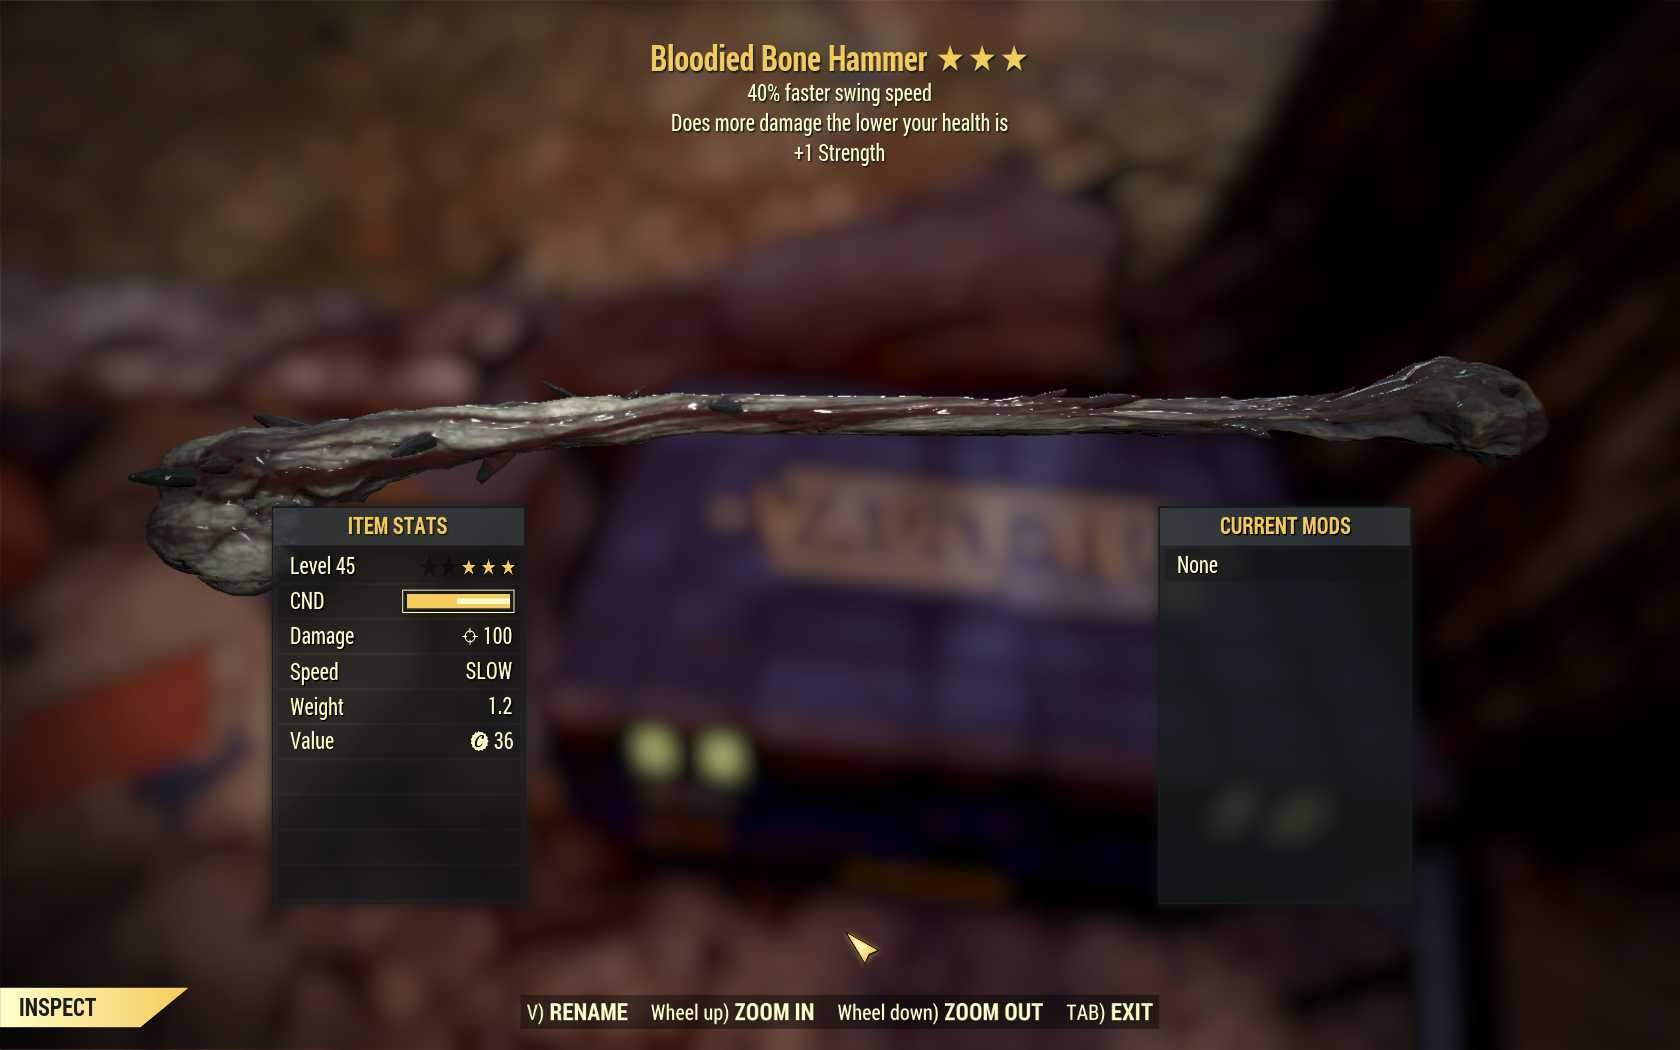 [PC] Bloodied Bone Hammer [40FSS | +1STR]